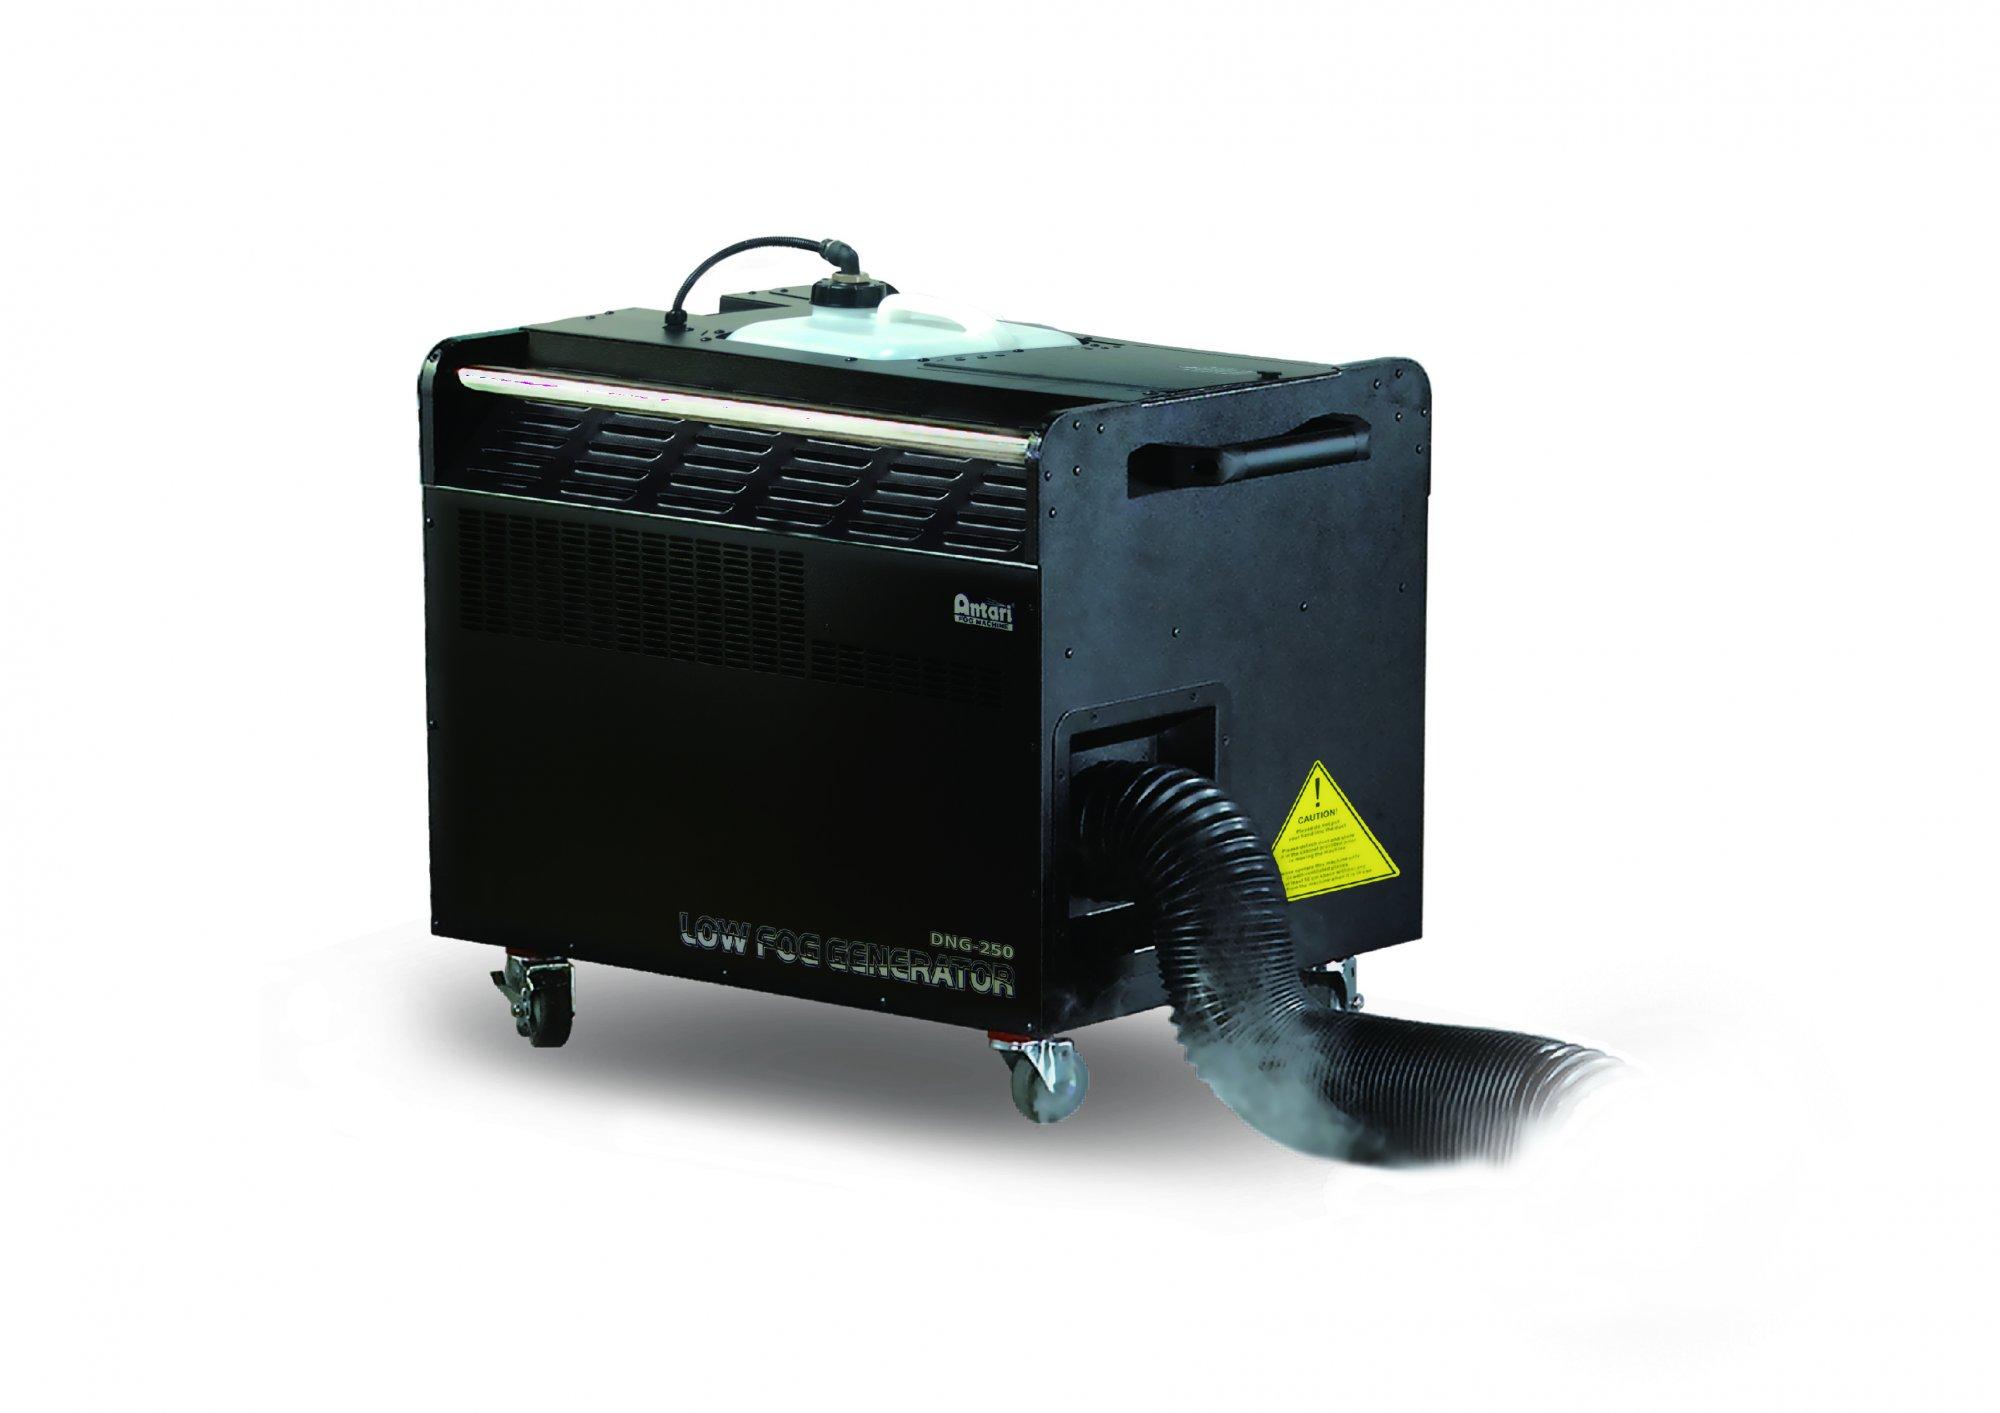 Antari DNG-250 Fog Machine - Low Lying Fog Generator, High Output